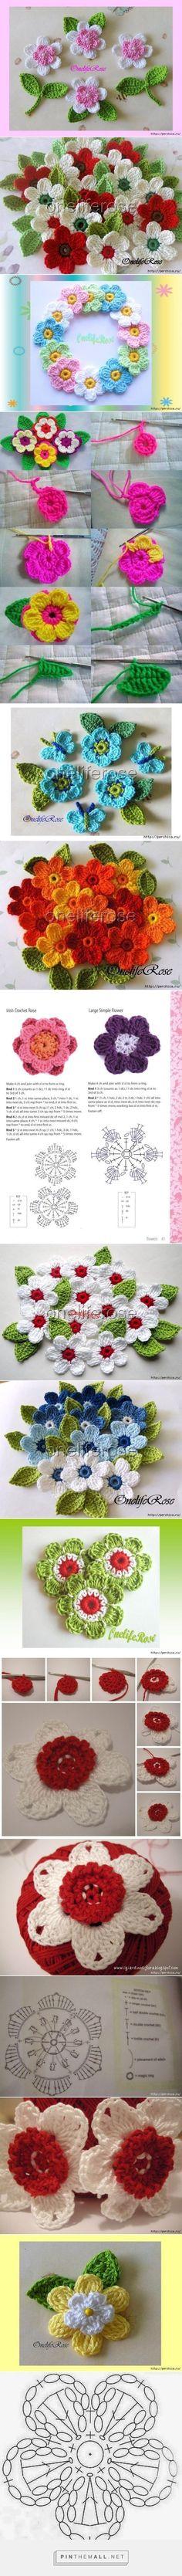 Irish Crochet Rose - Large Simple Flower